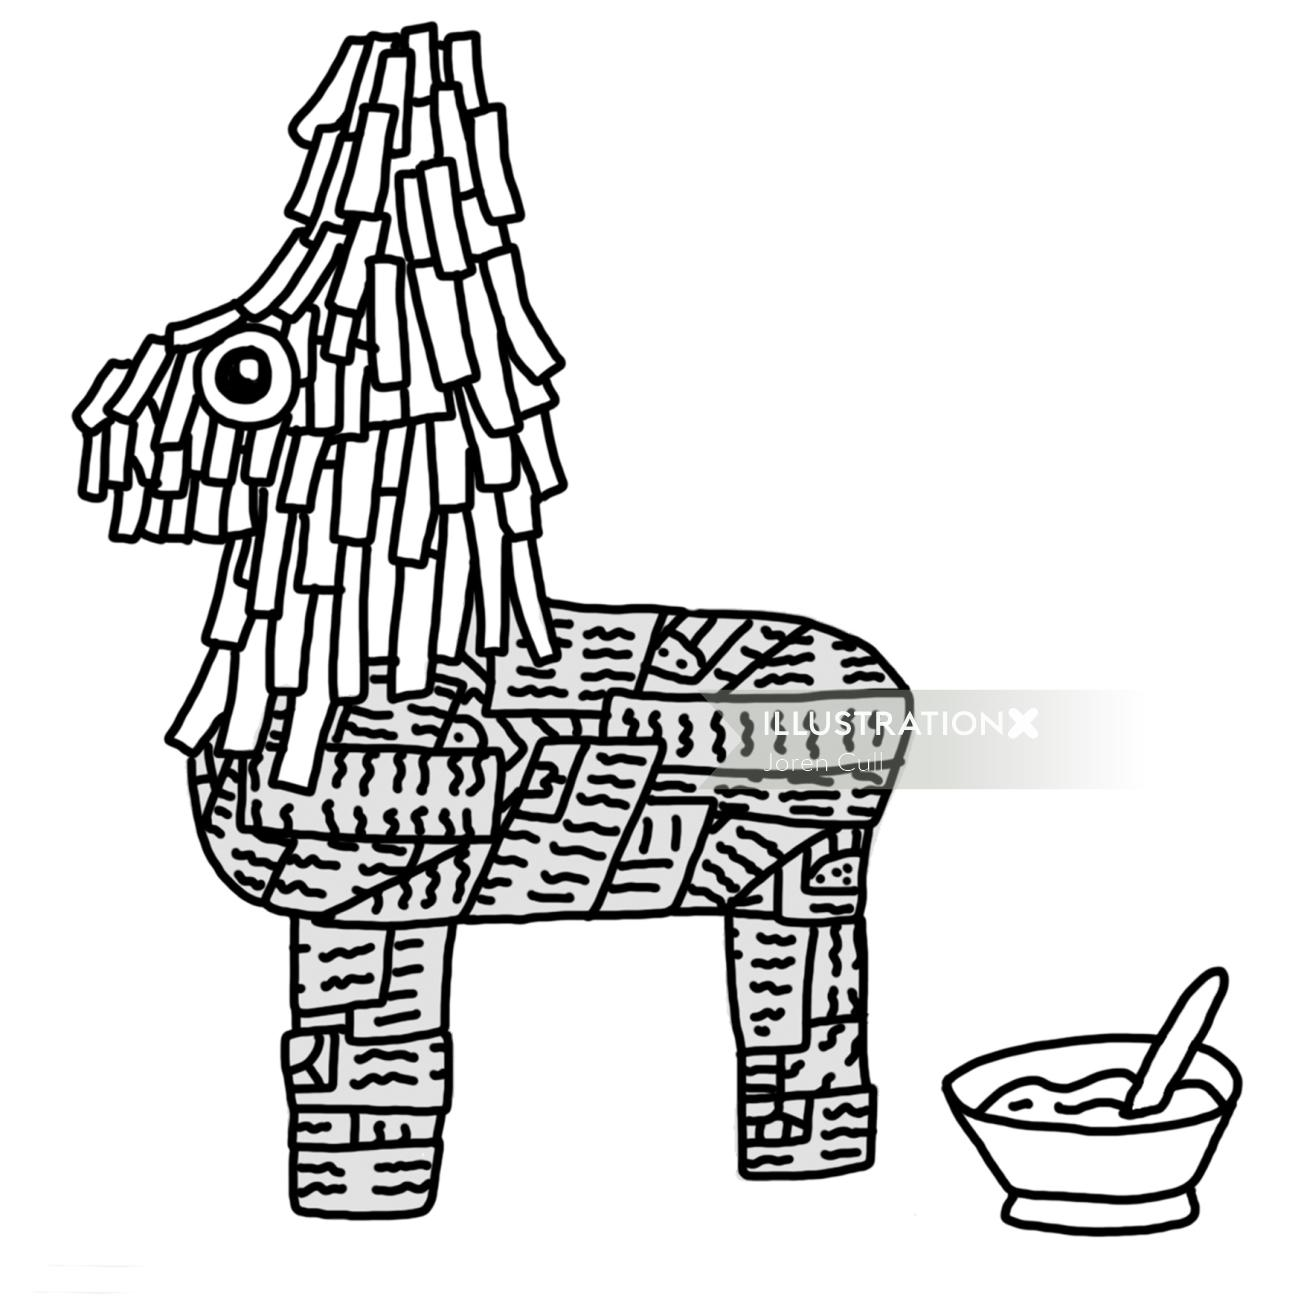 Black and white illustration of paper doll